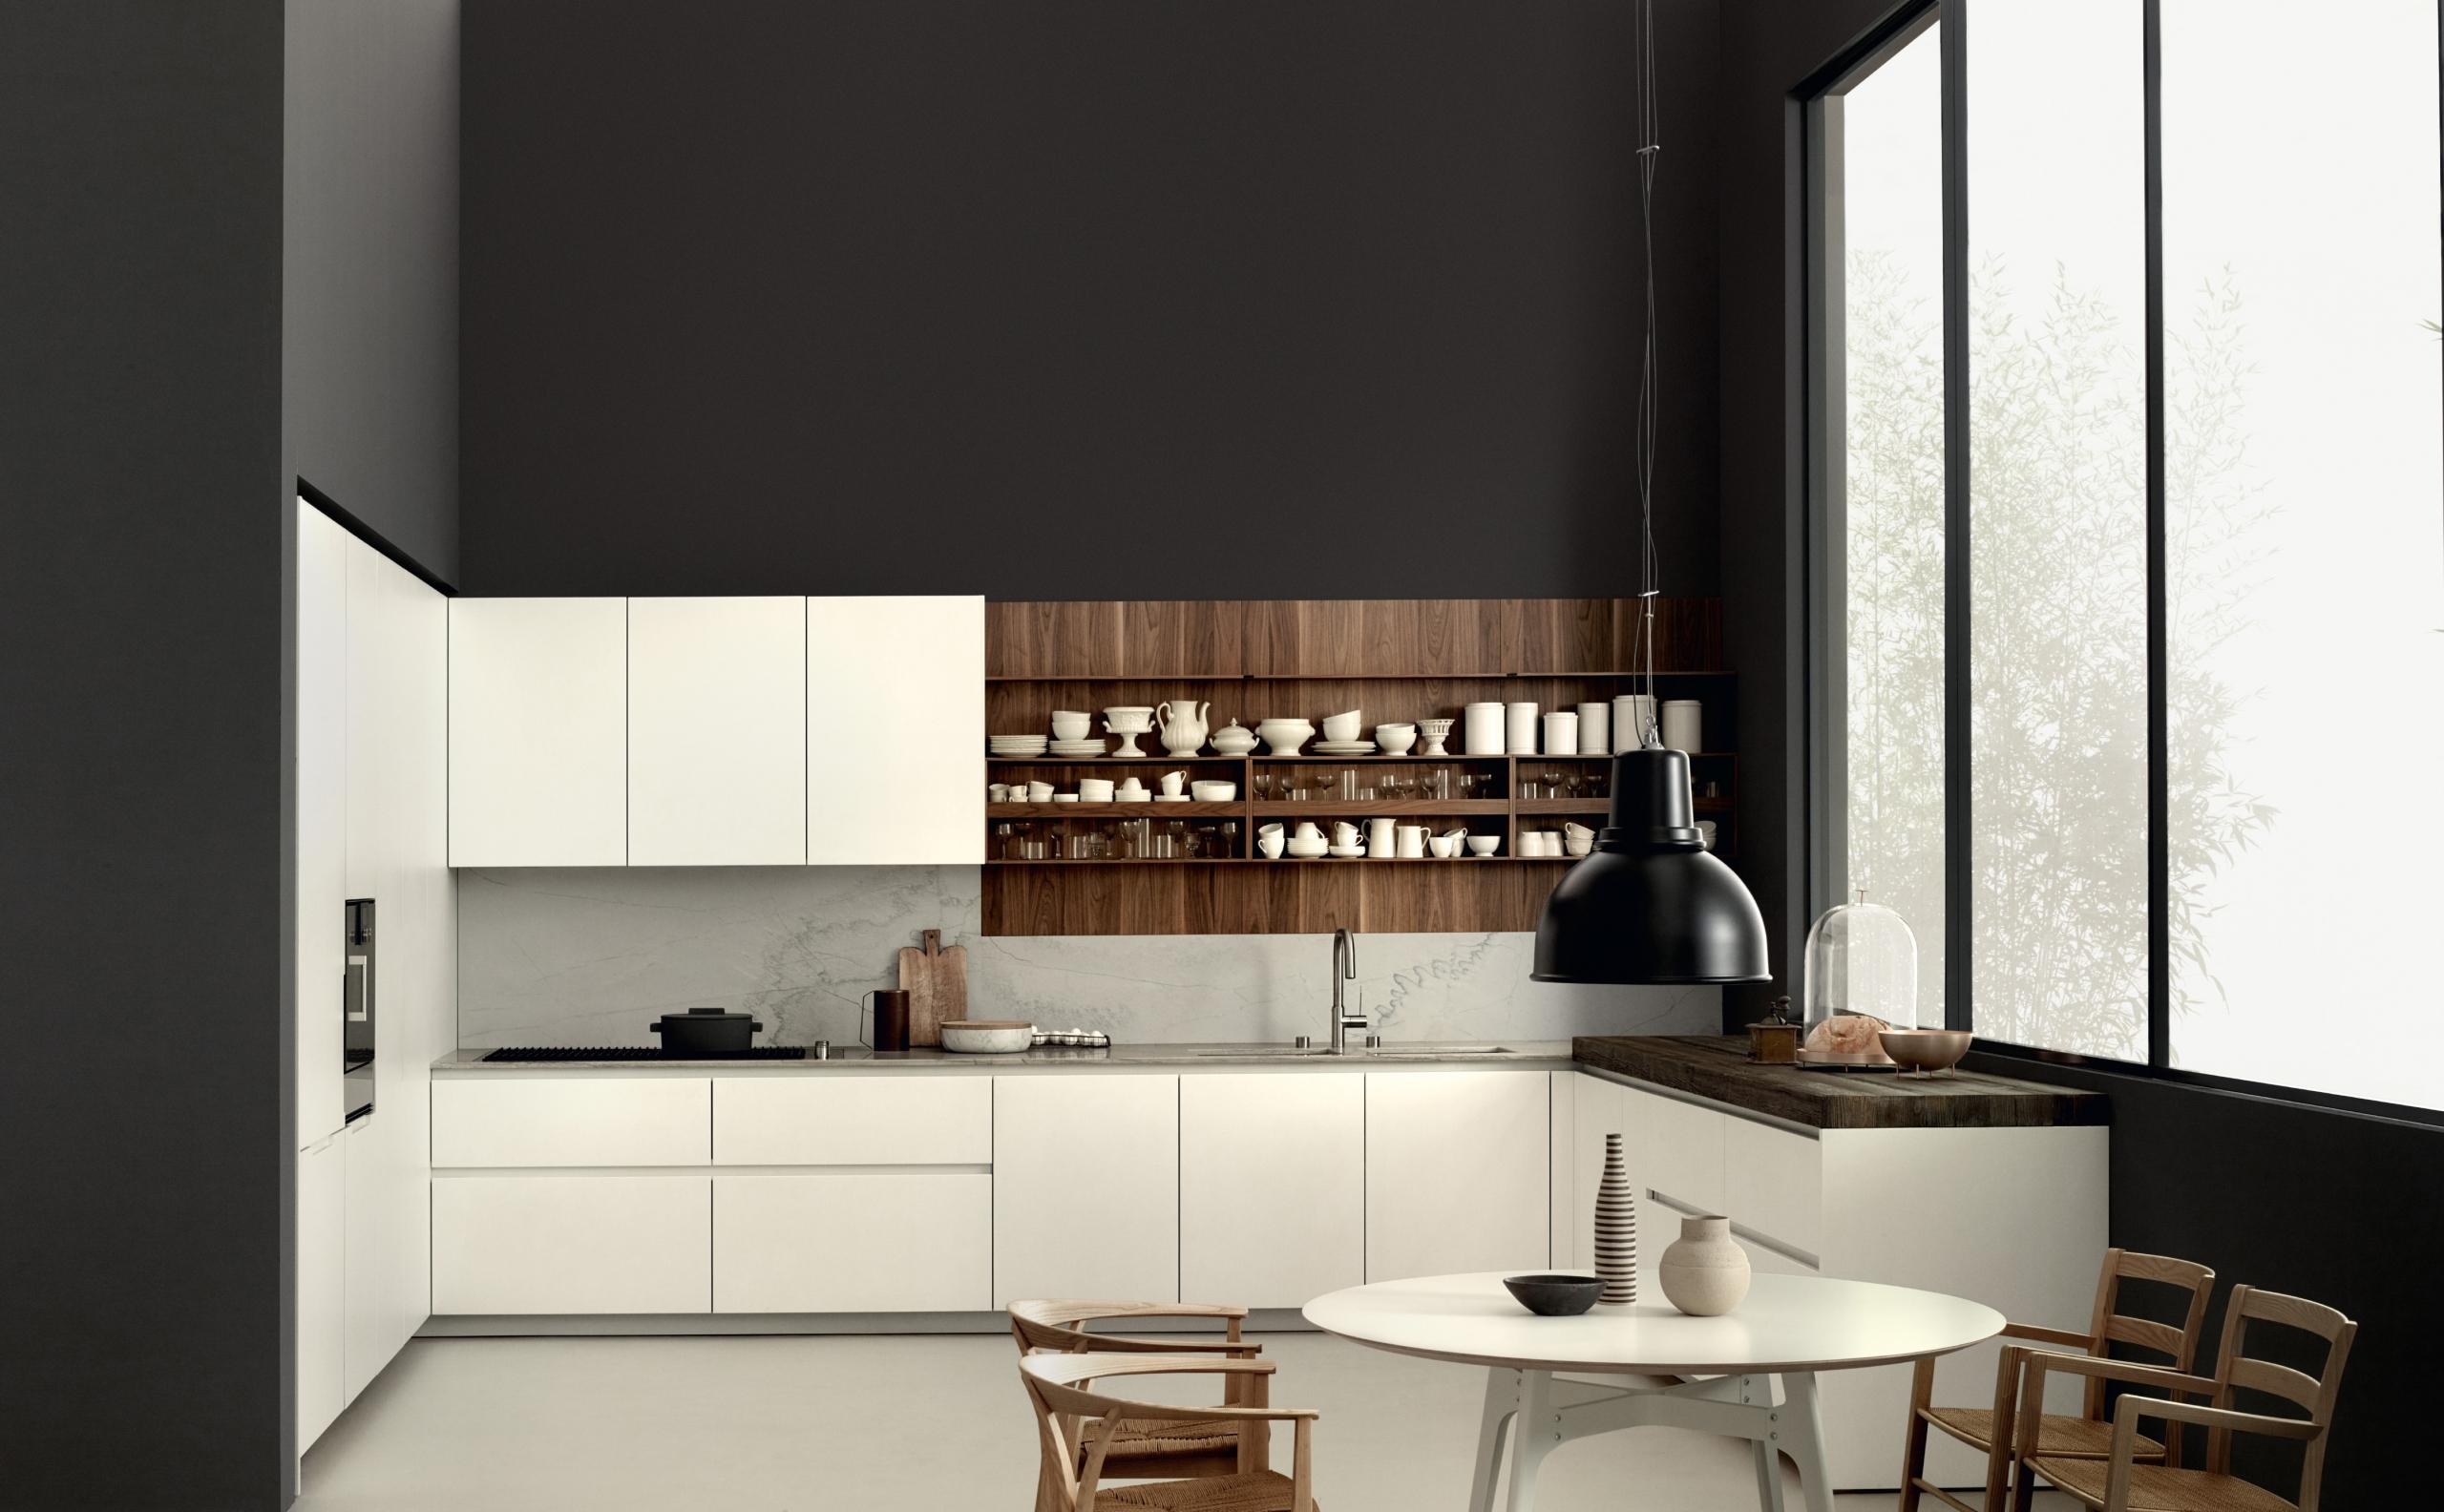 boffi-xila-cozinha-reedicao-milao-2021 (2)